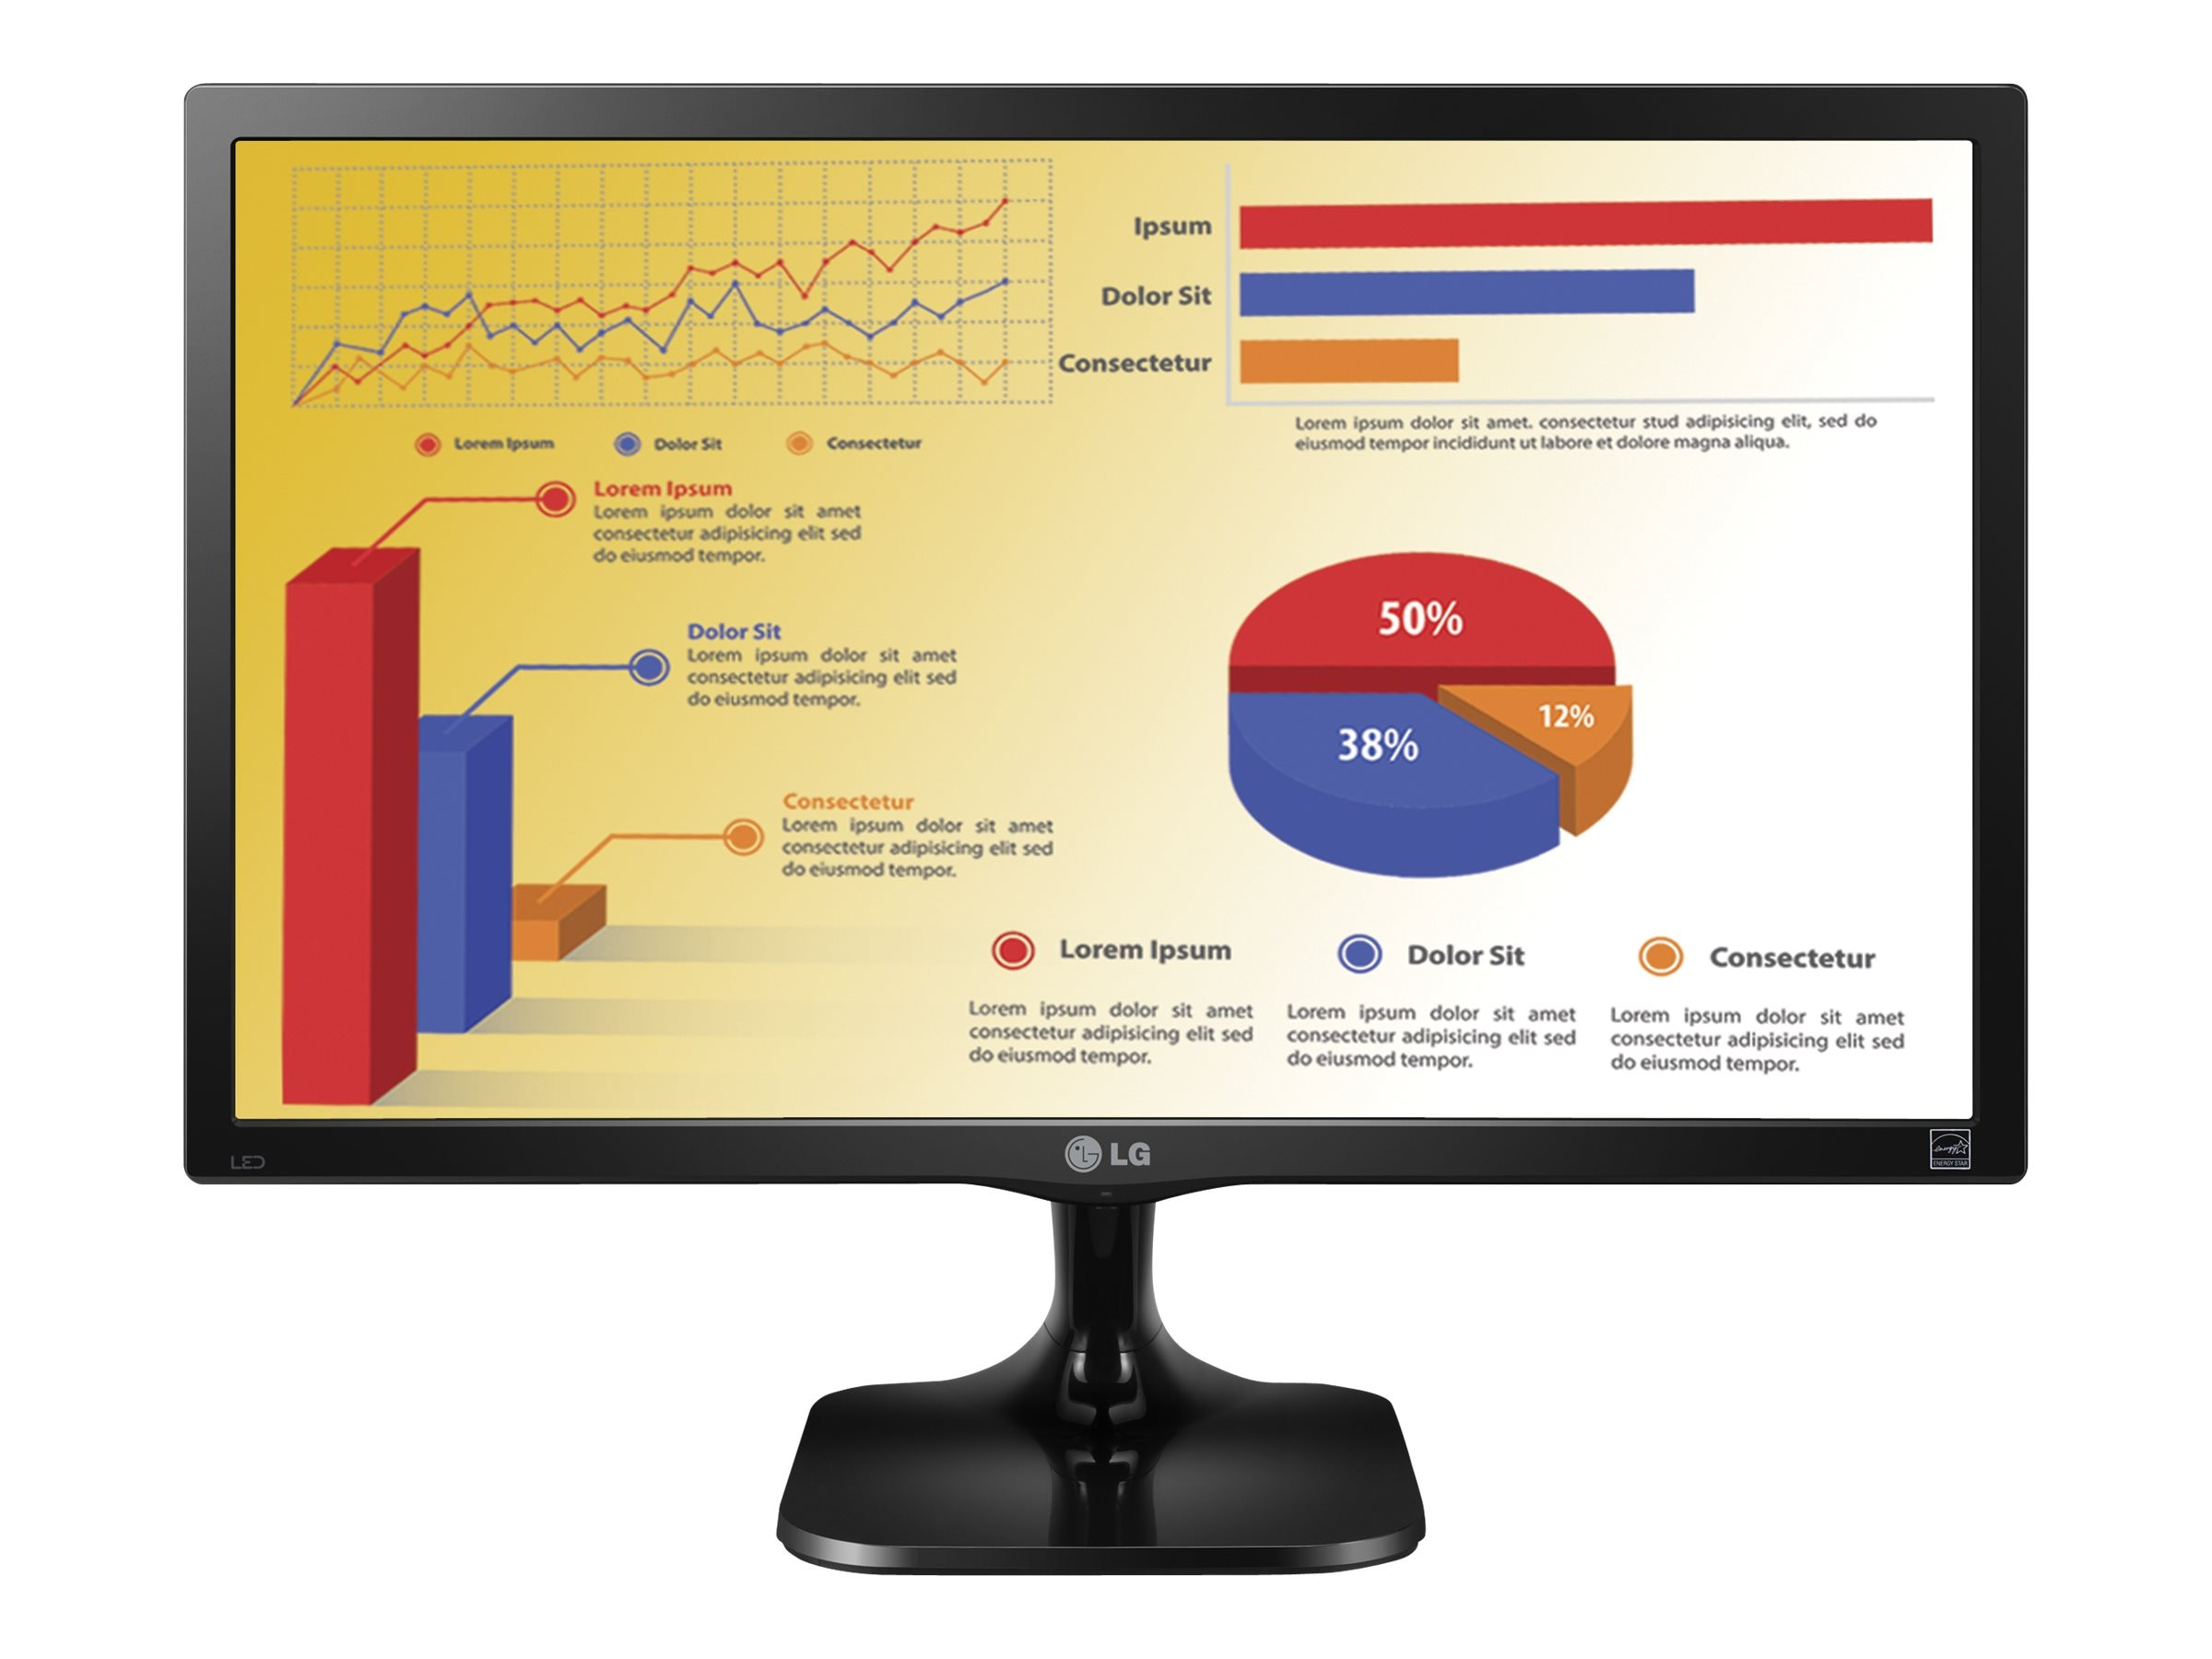 LG 24 MC37D-B Full HD LED-LCD Monitor, Black, 24MC37D-B, 18474423, Monitors